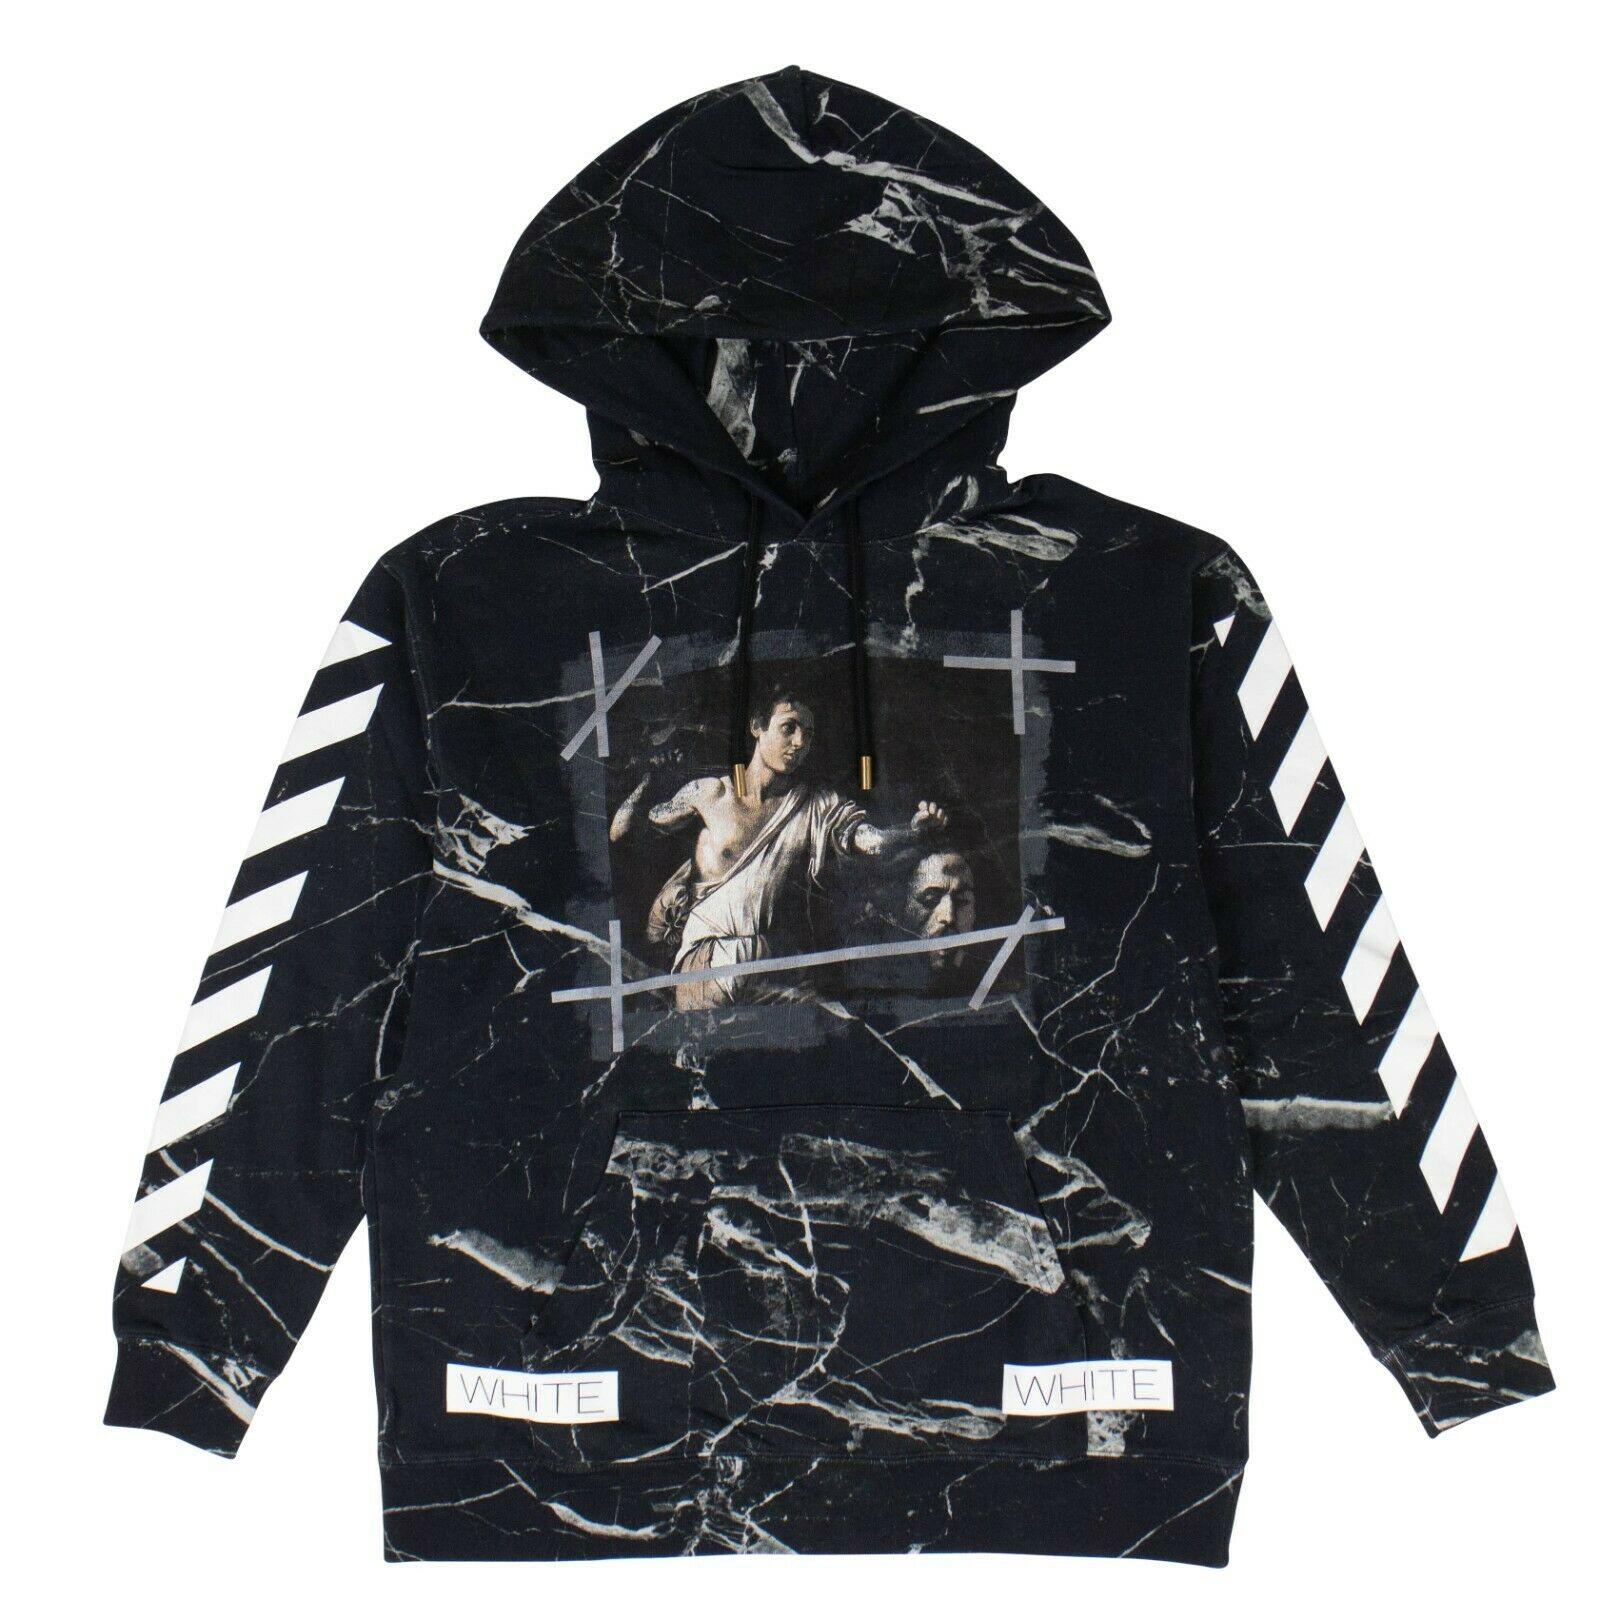 Off White Black Marble Hoodie Sweatshirt Size S Grailed